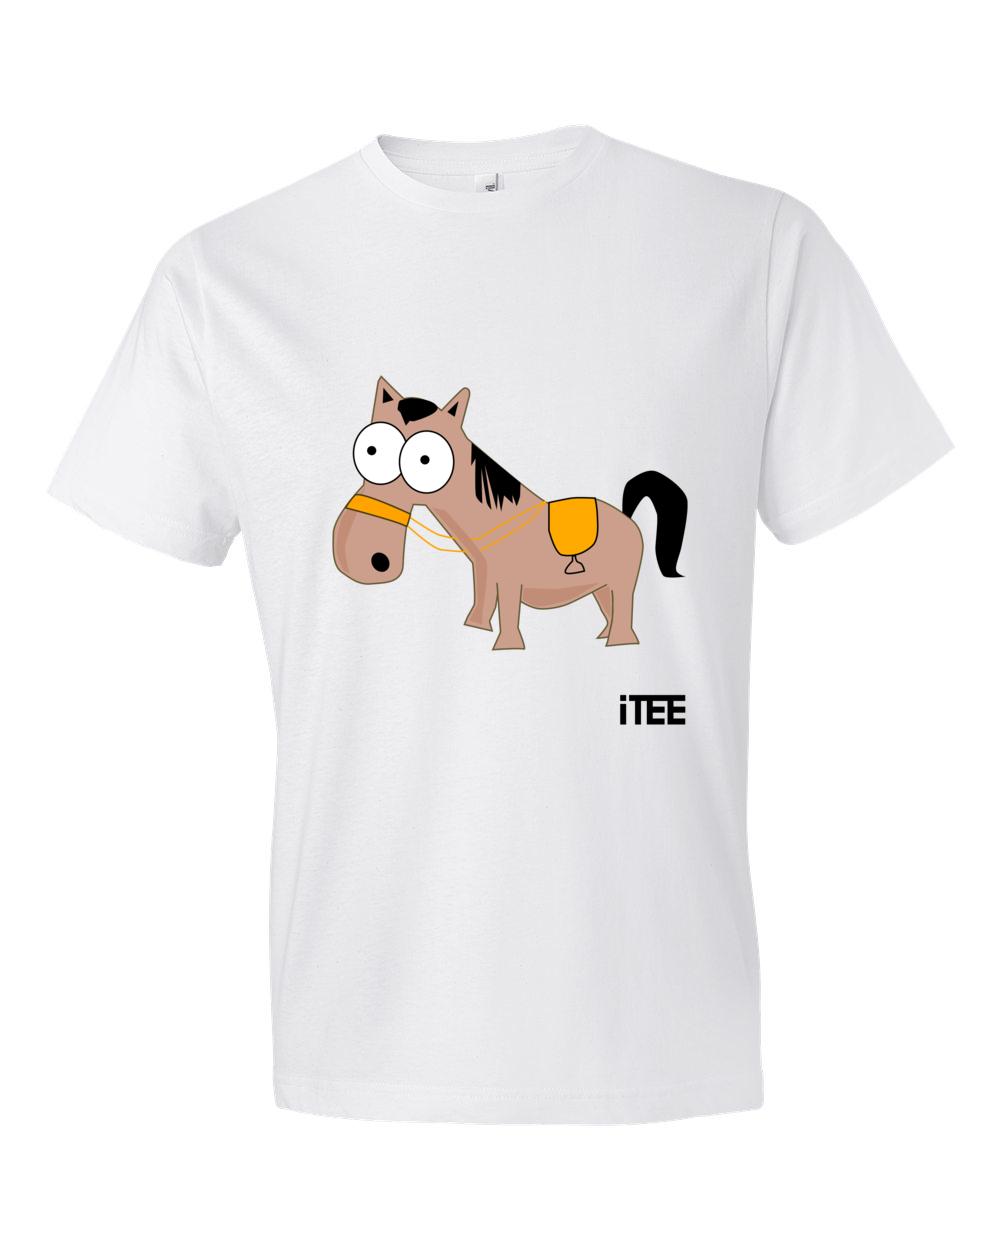 Donkey-Lightweight-Fashion-Short-Sleeve-T-Shirt-by-iTEE.com